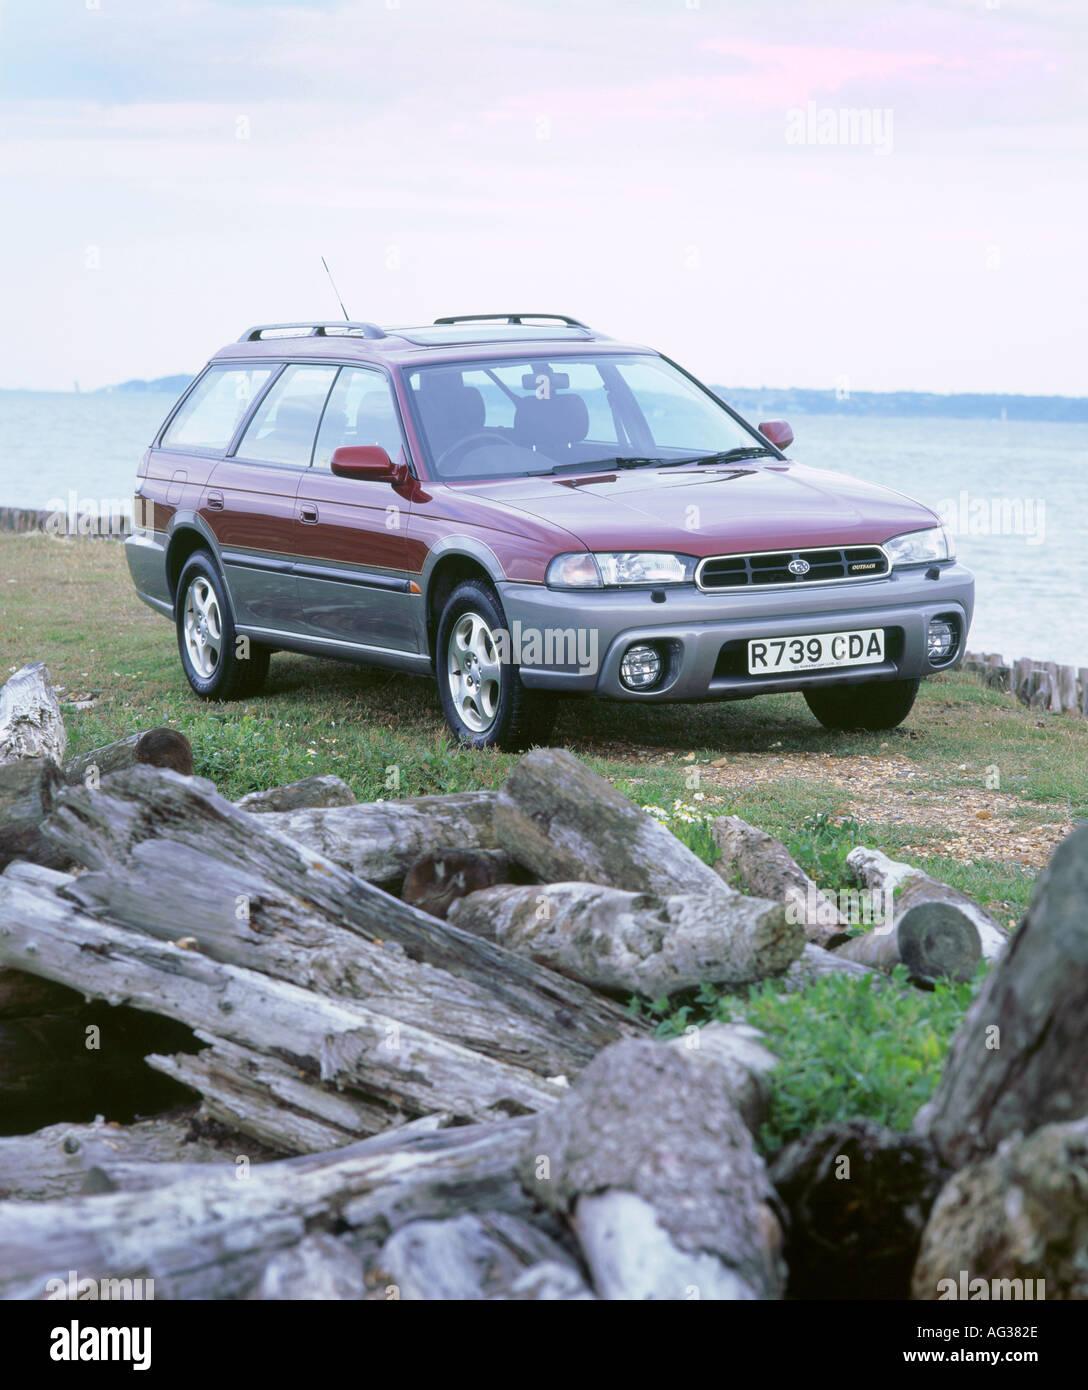 Subaru Legacy Stockfotos Bilder Alamy 1998 Outback Interior Stockbild